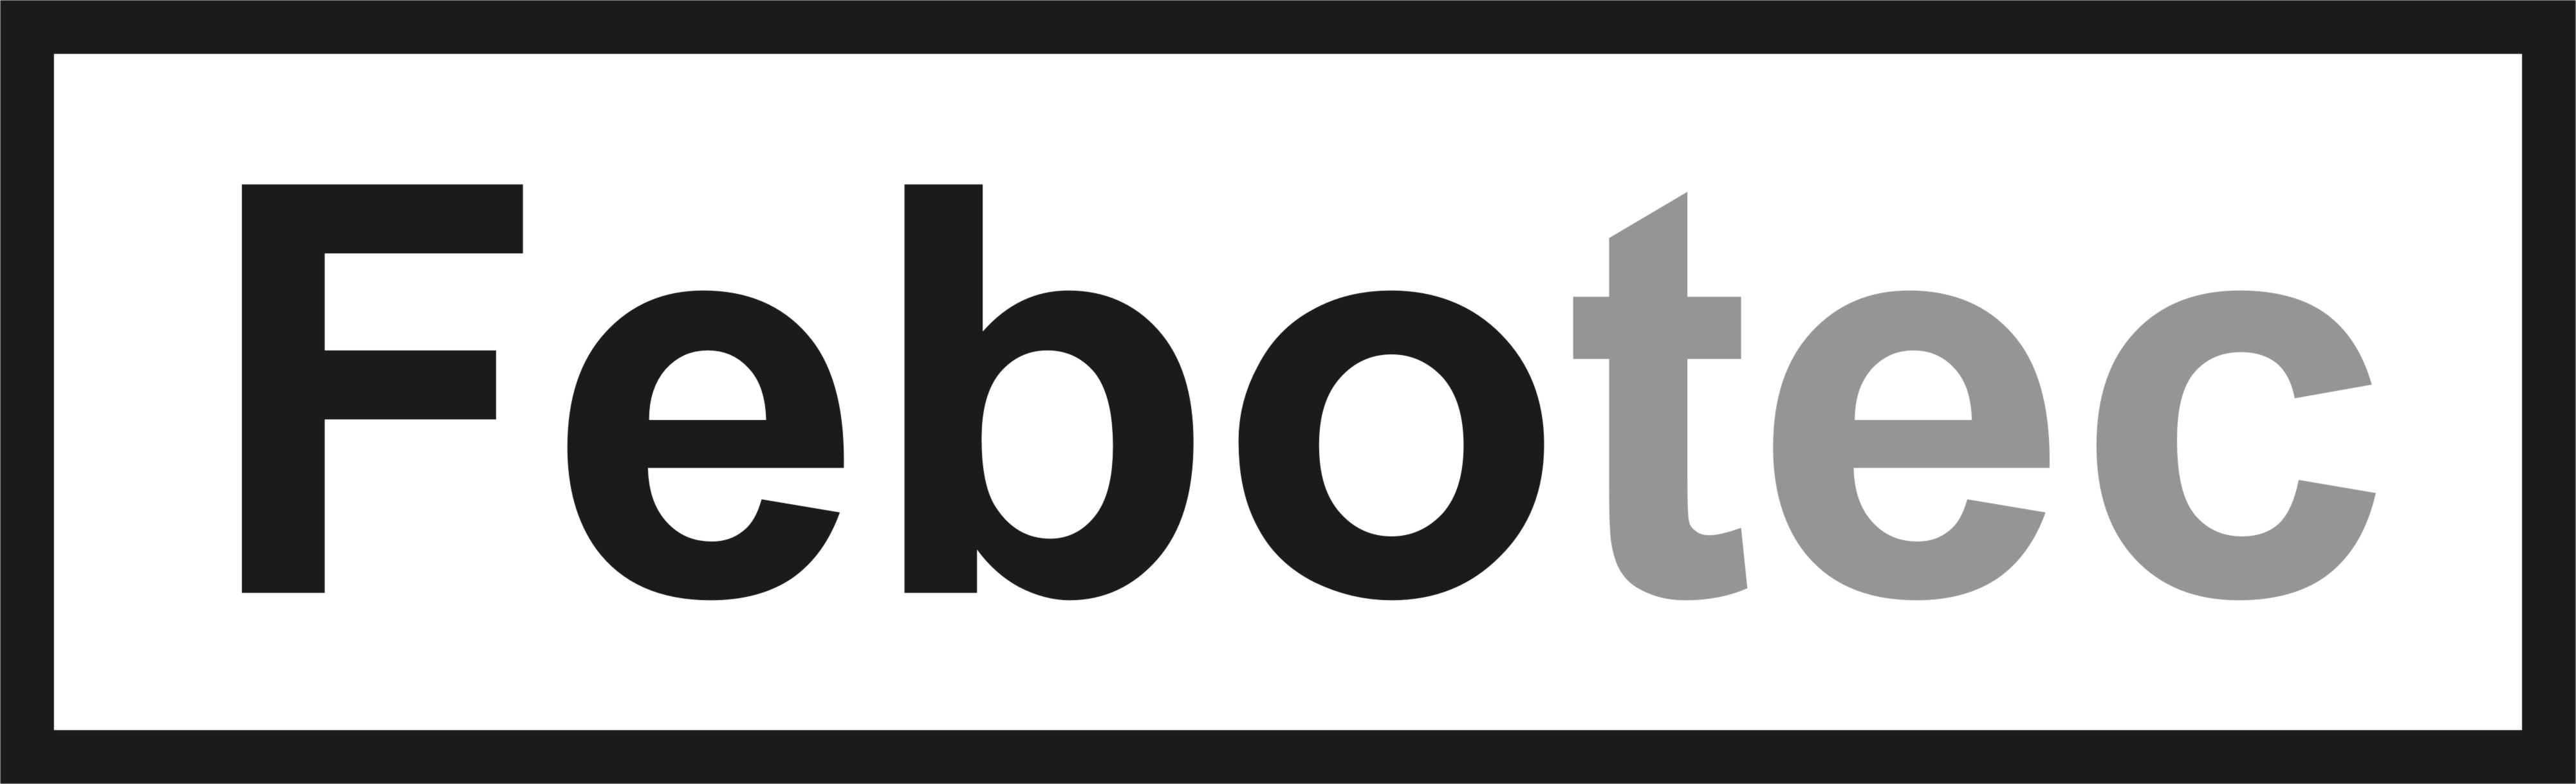 logo Febotec 3